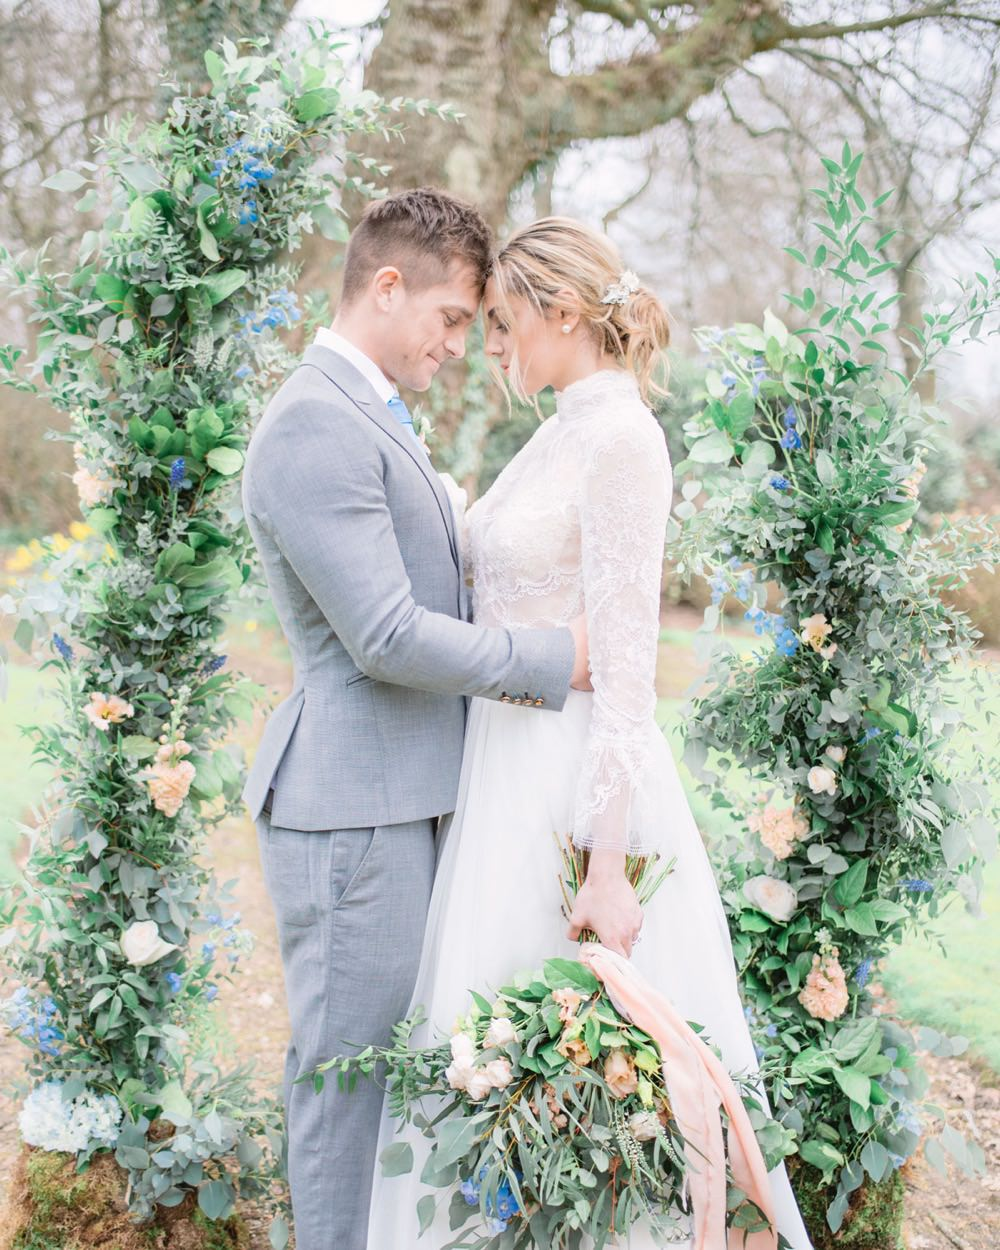 Elegant Wedding Ideas Yll Weddings Unstructured Flower Arch Peach Greenery Foliage Backdrop Natural